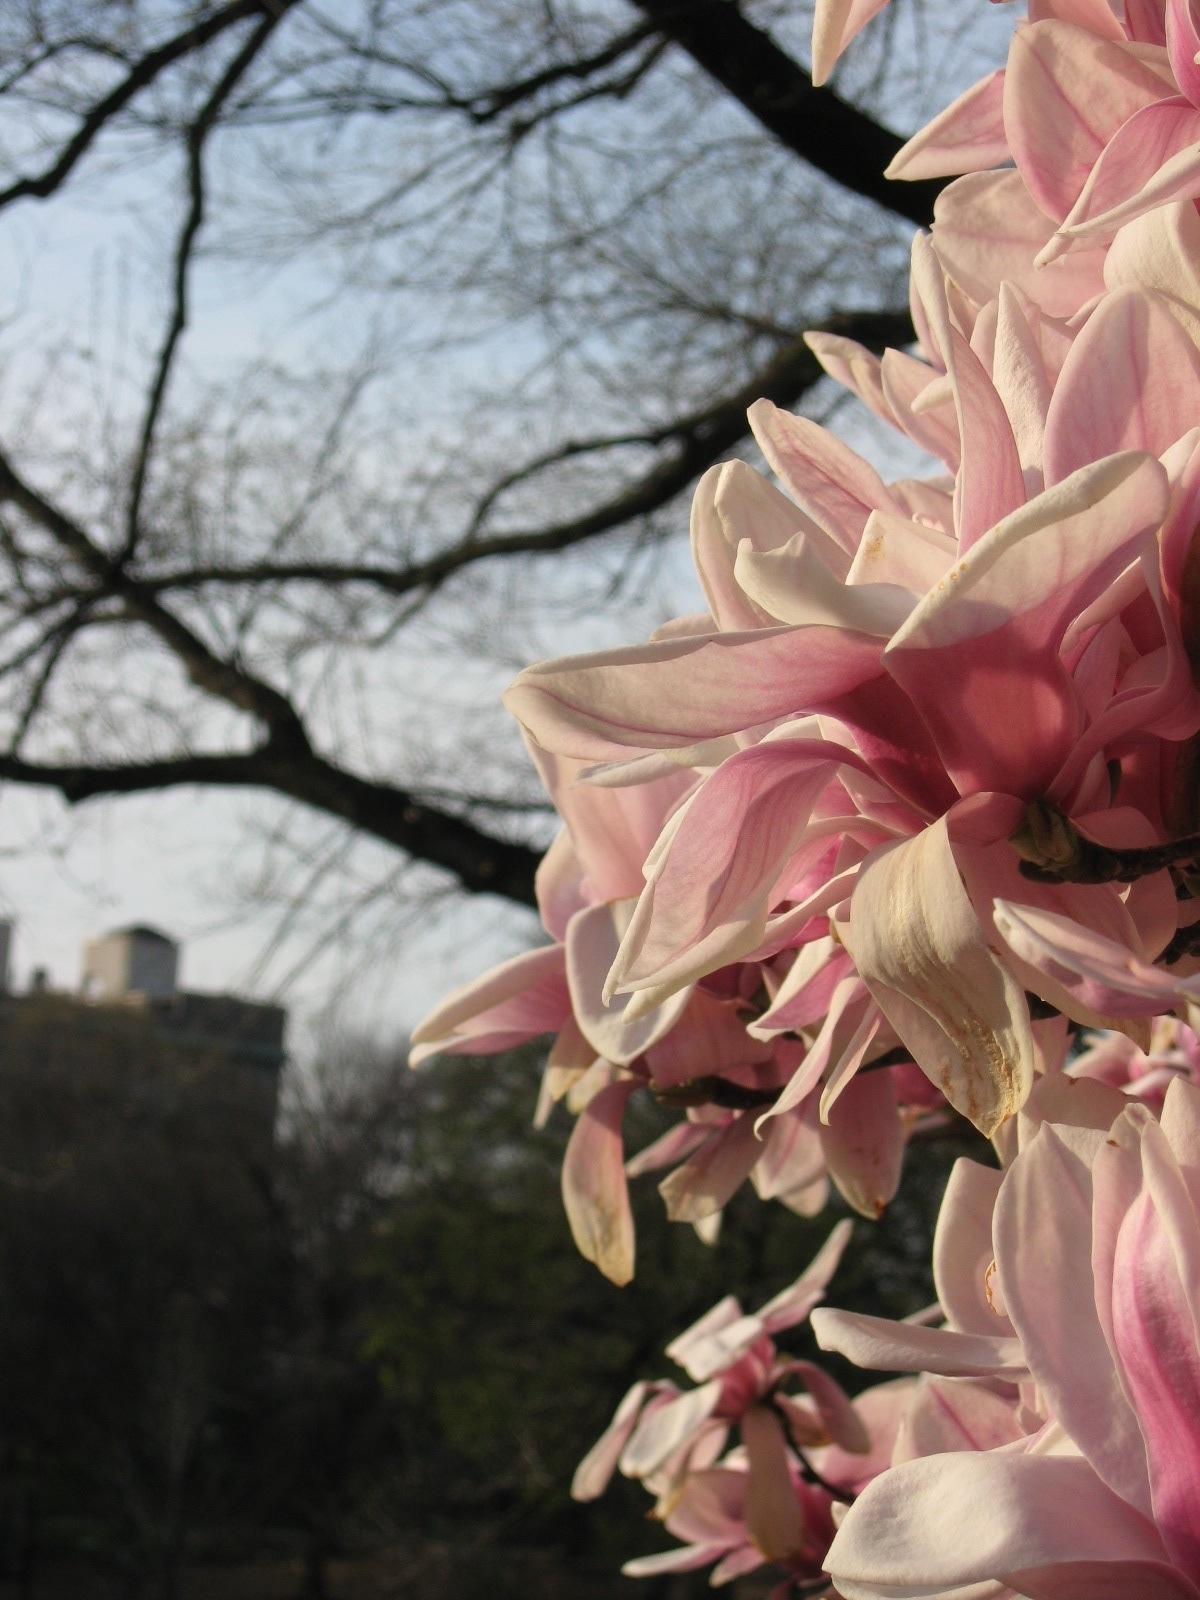 Magnolias in spring, Prospect Park, Brooklyn